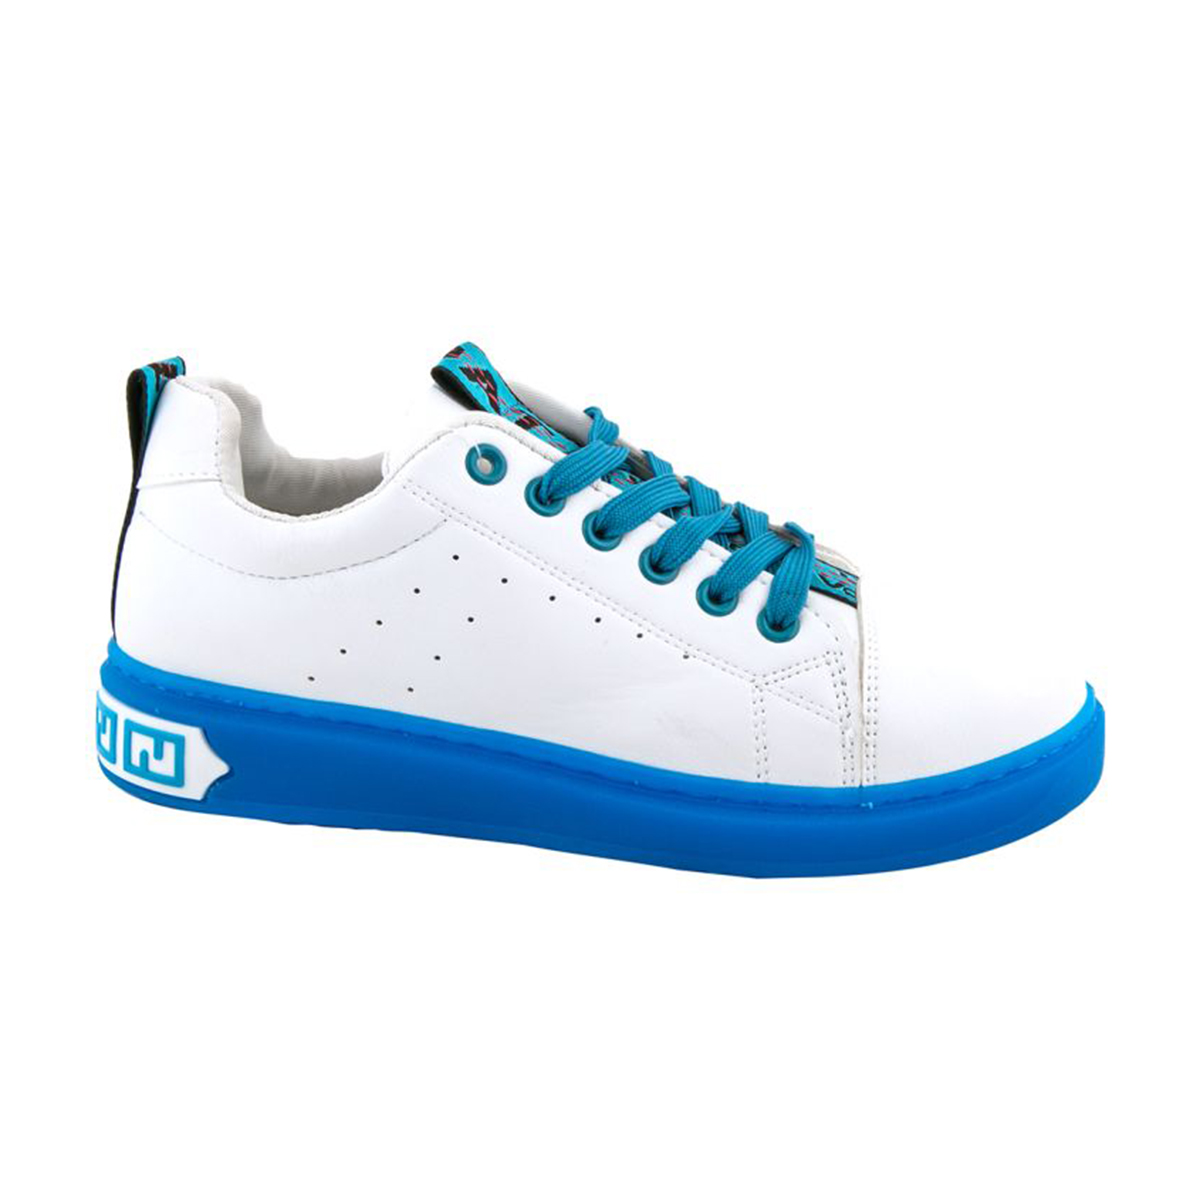 Sneakers γυναικεία Νο 9066 - Λευκό / μπλε